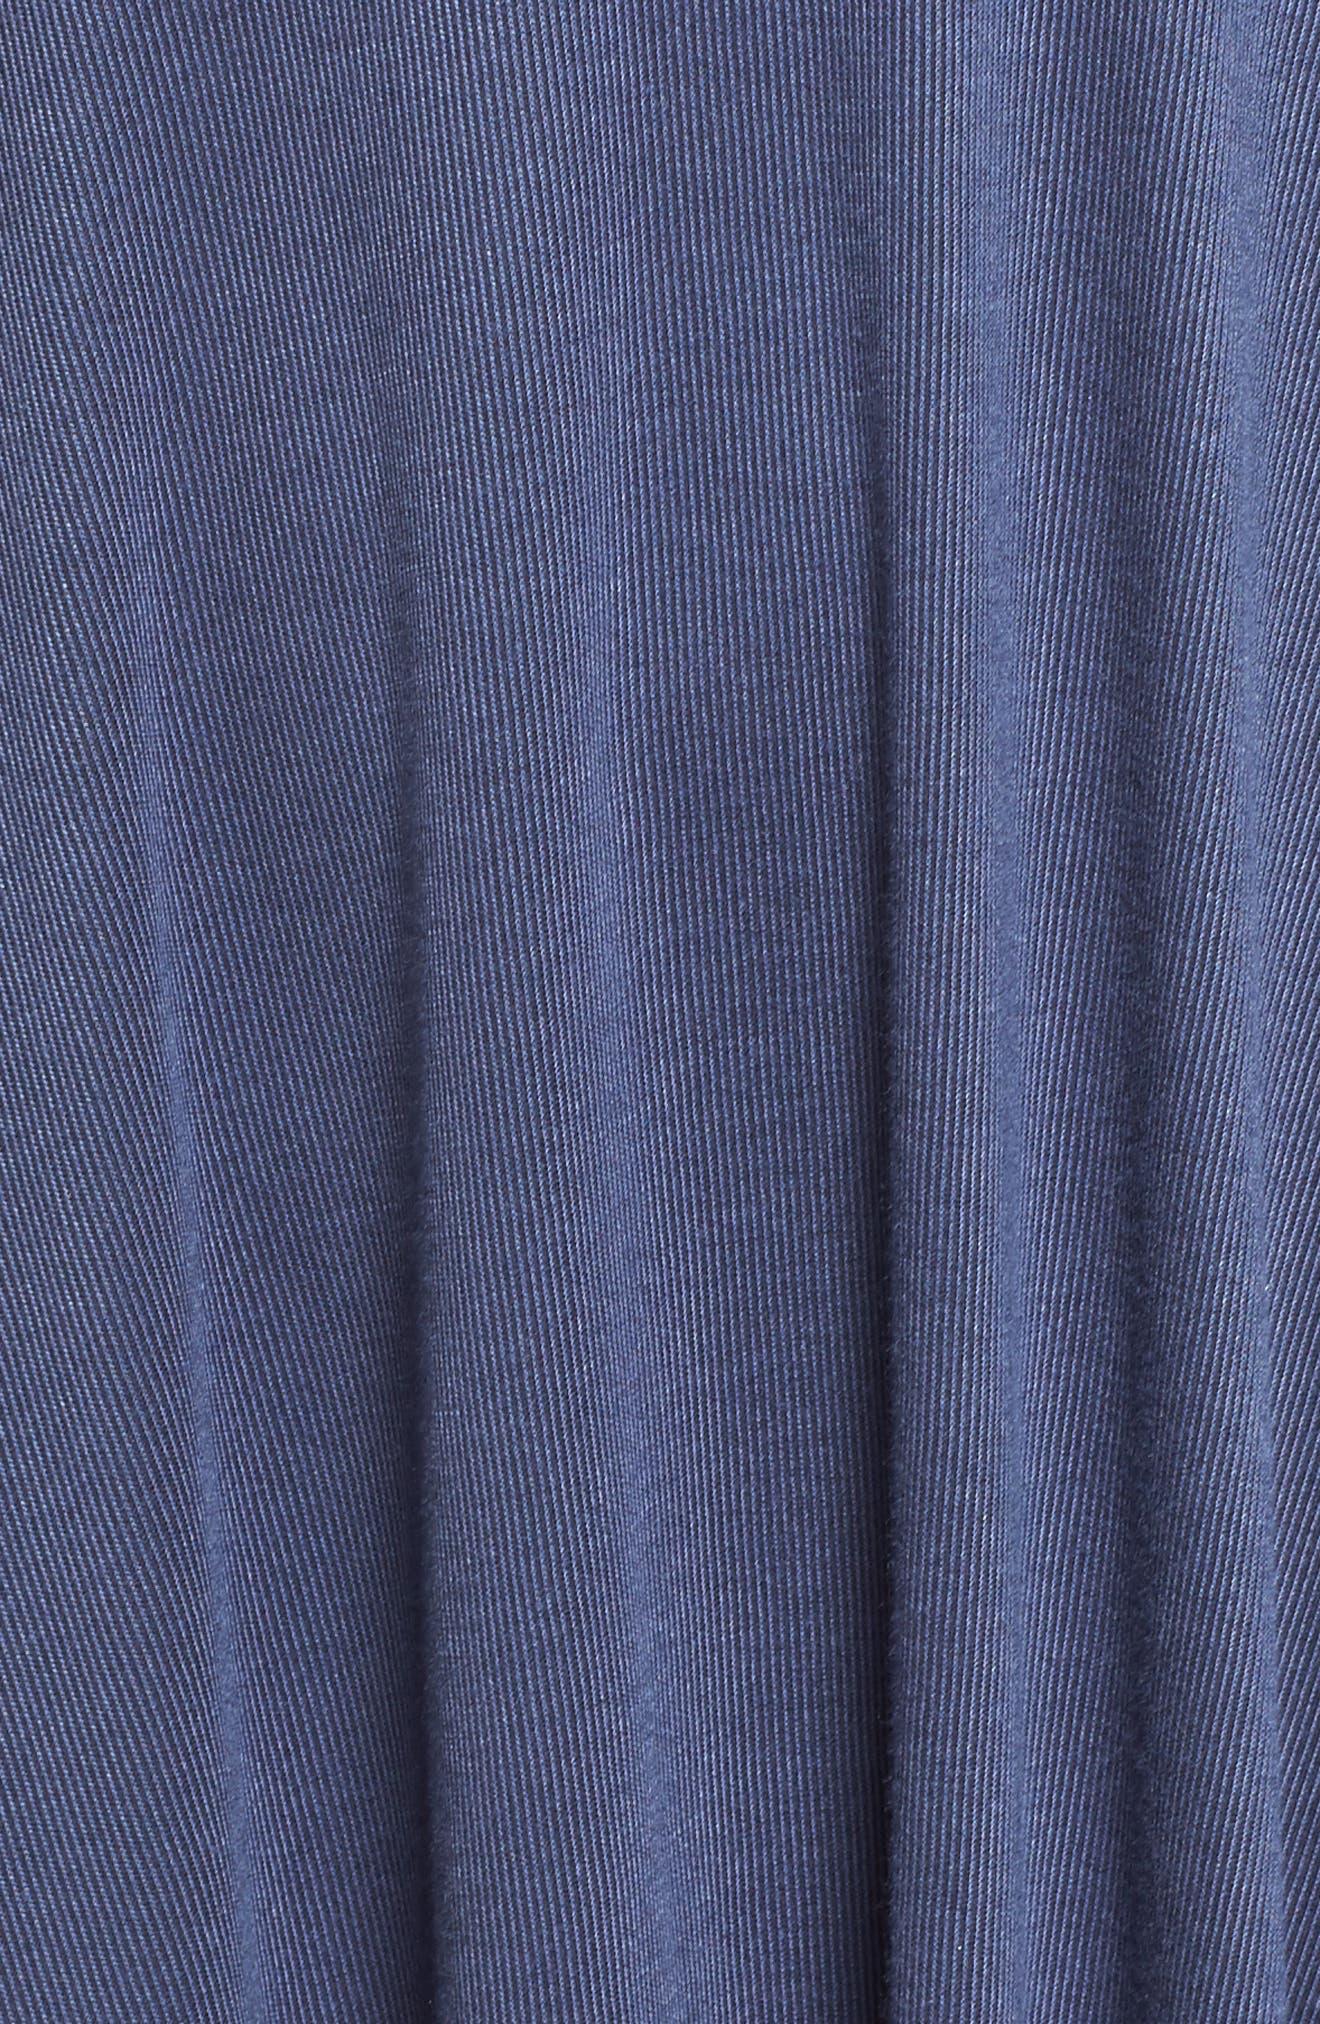 Flutter Sleeve Knit Dress,                             Alternate thumbnail 5, color,                             420